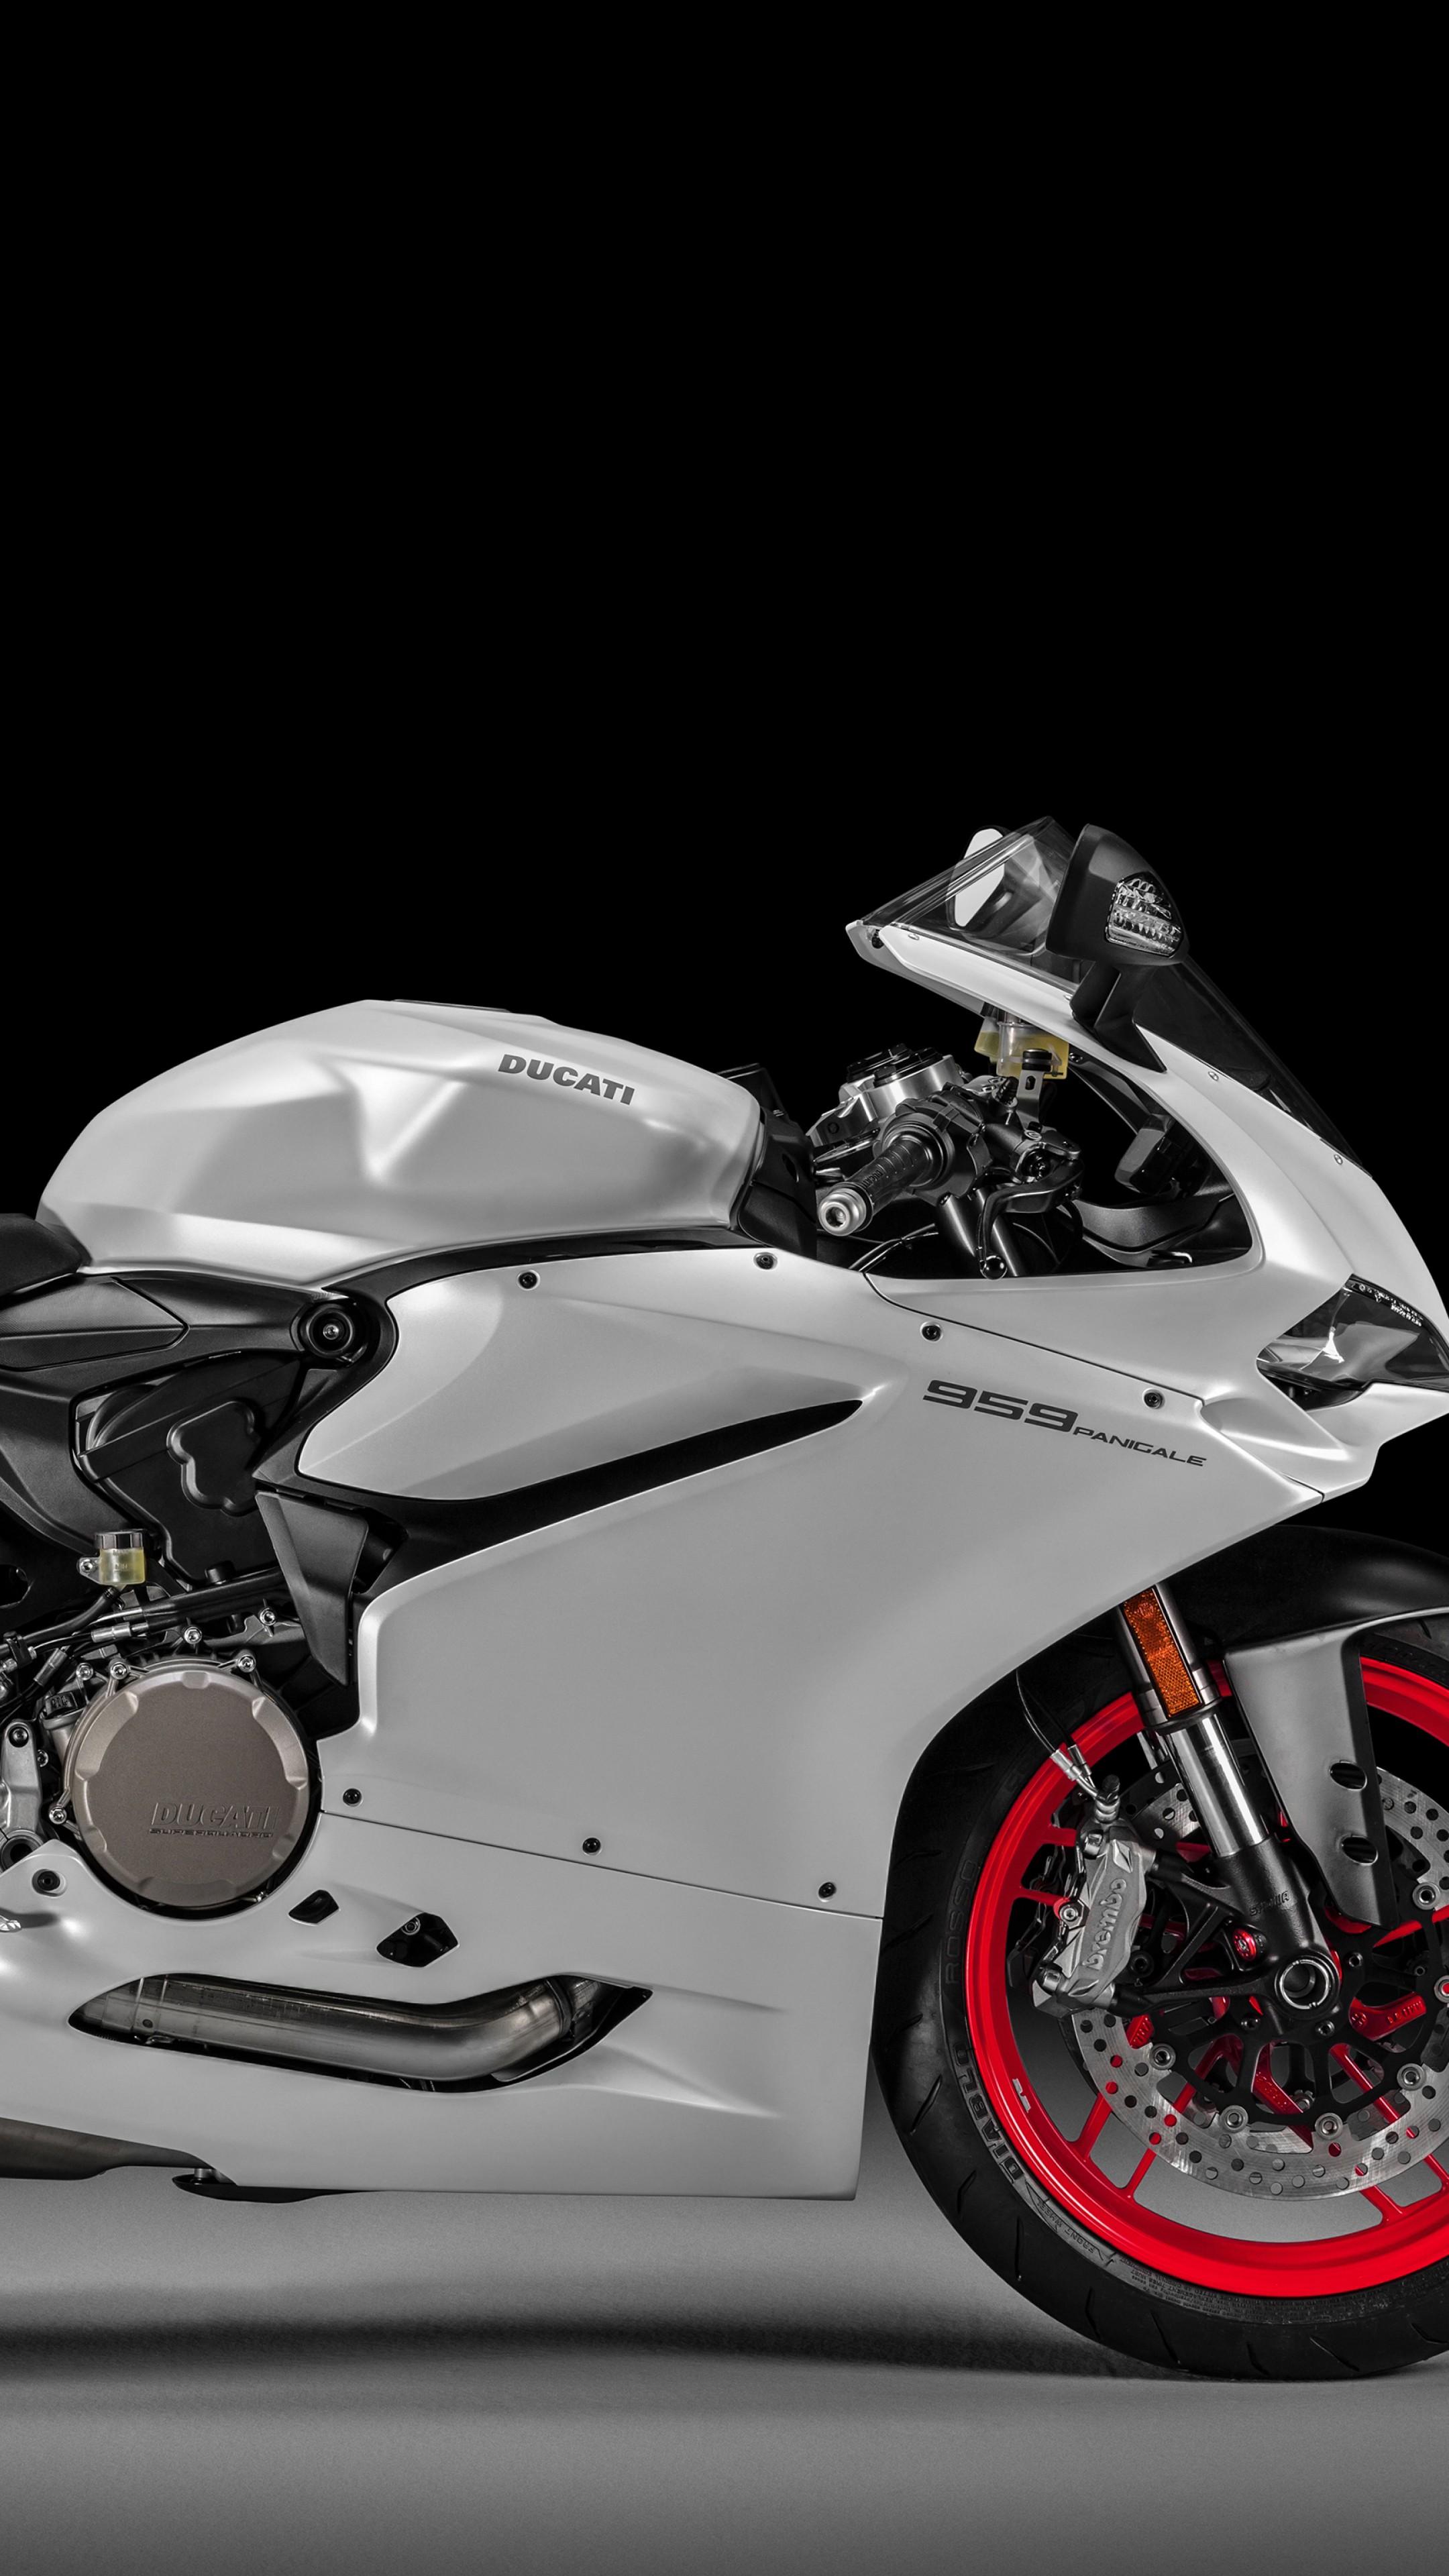 Kawasaki Ninja H2r >> Wallpaper ducati 959 panigale, turing bike 2016, best ...